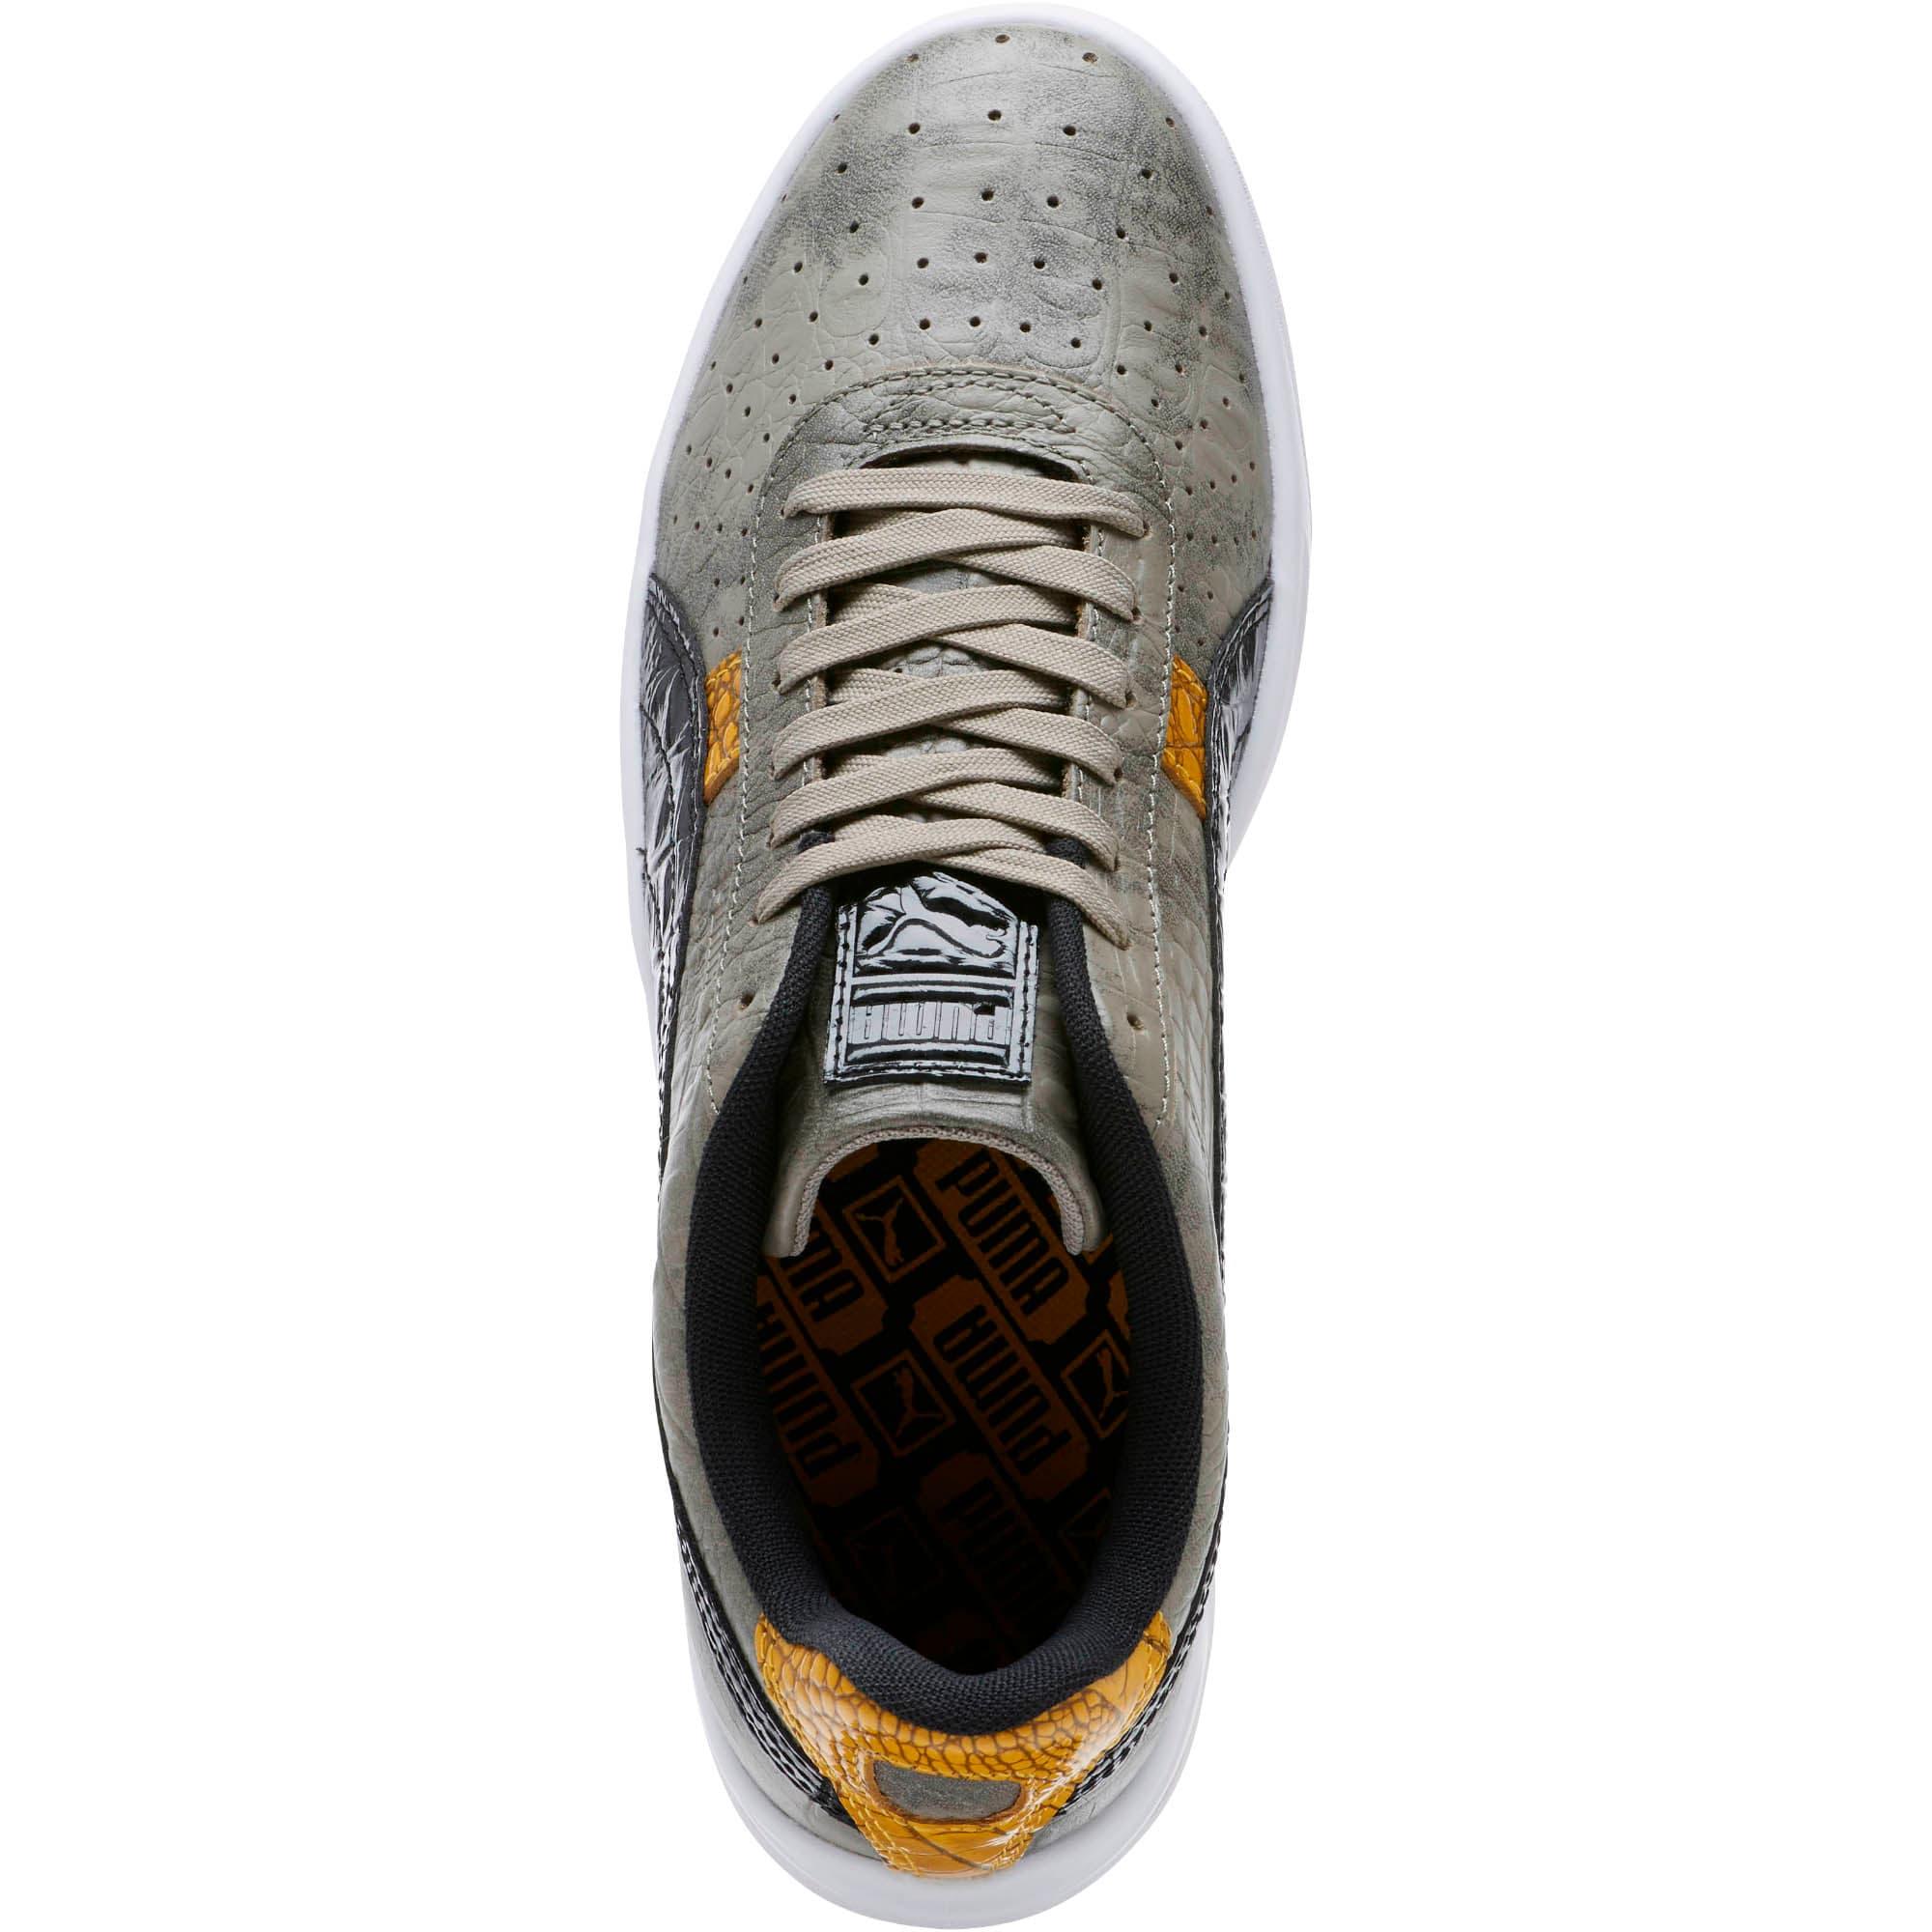 Thumbnail 5 of GV Special+ Gator Gray Men's Sneakers, Elephant Skin-Puma Black, medium